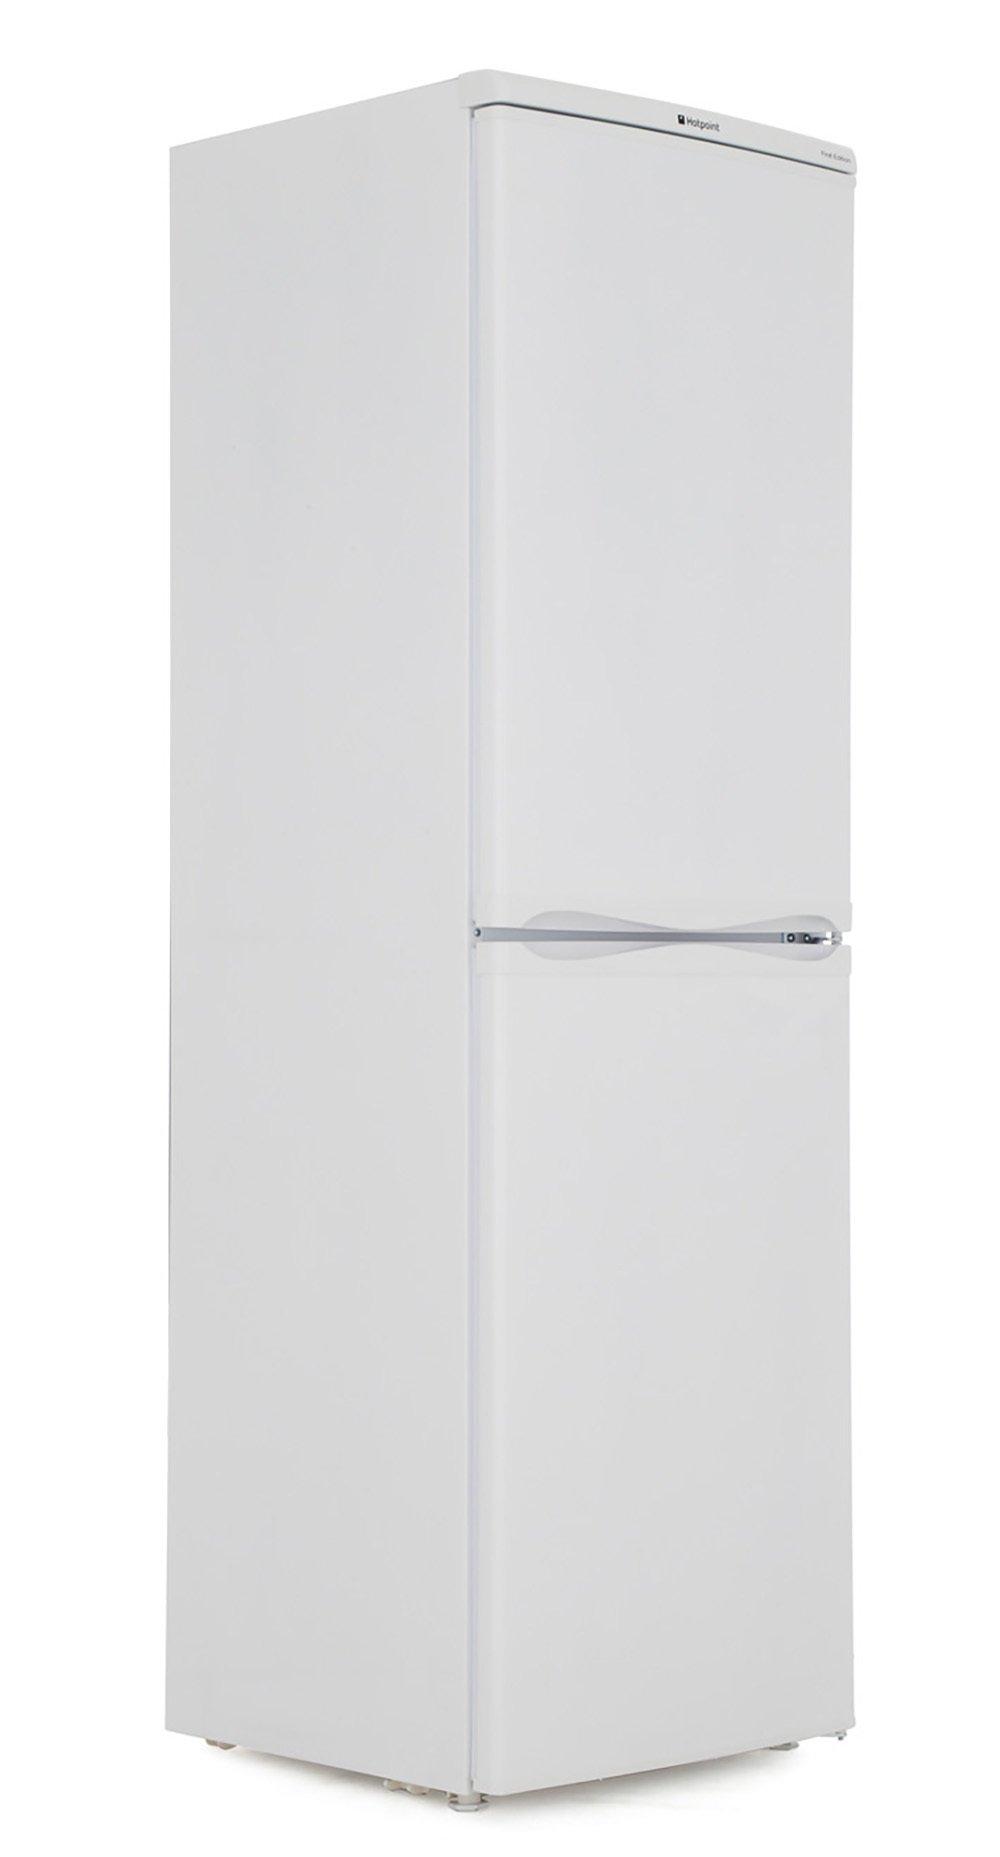 Hotpoint HBD 5517 W UK Static Fridge Freezer